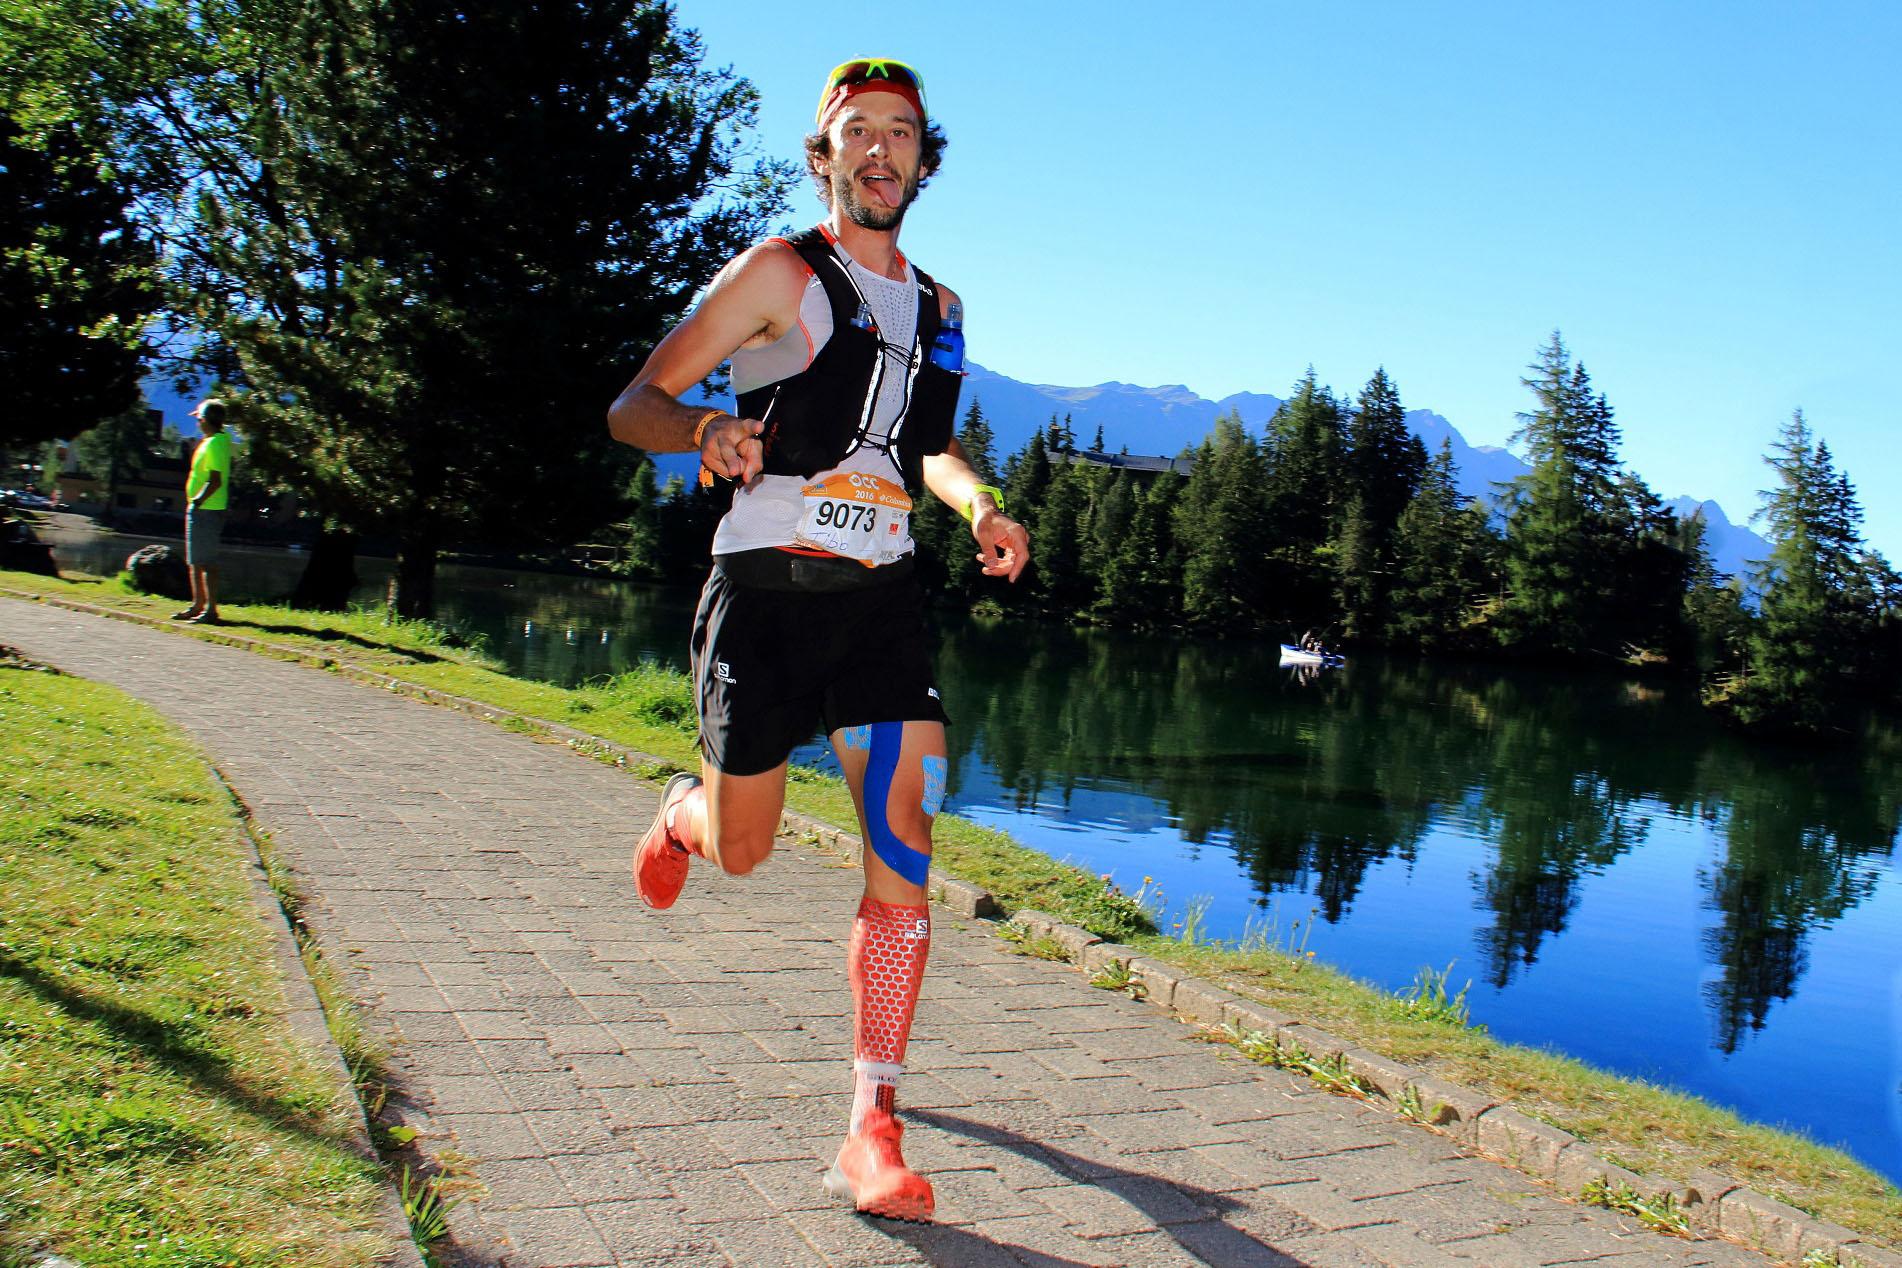 2-thibaut-baronian-occ-2016-photo-goran-mojicevic-passion-trail